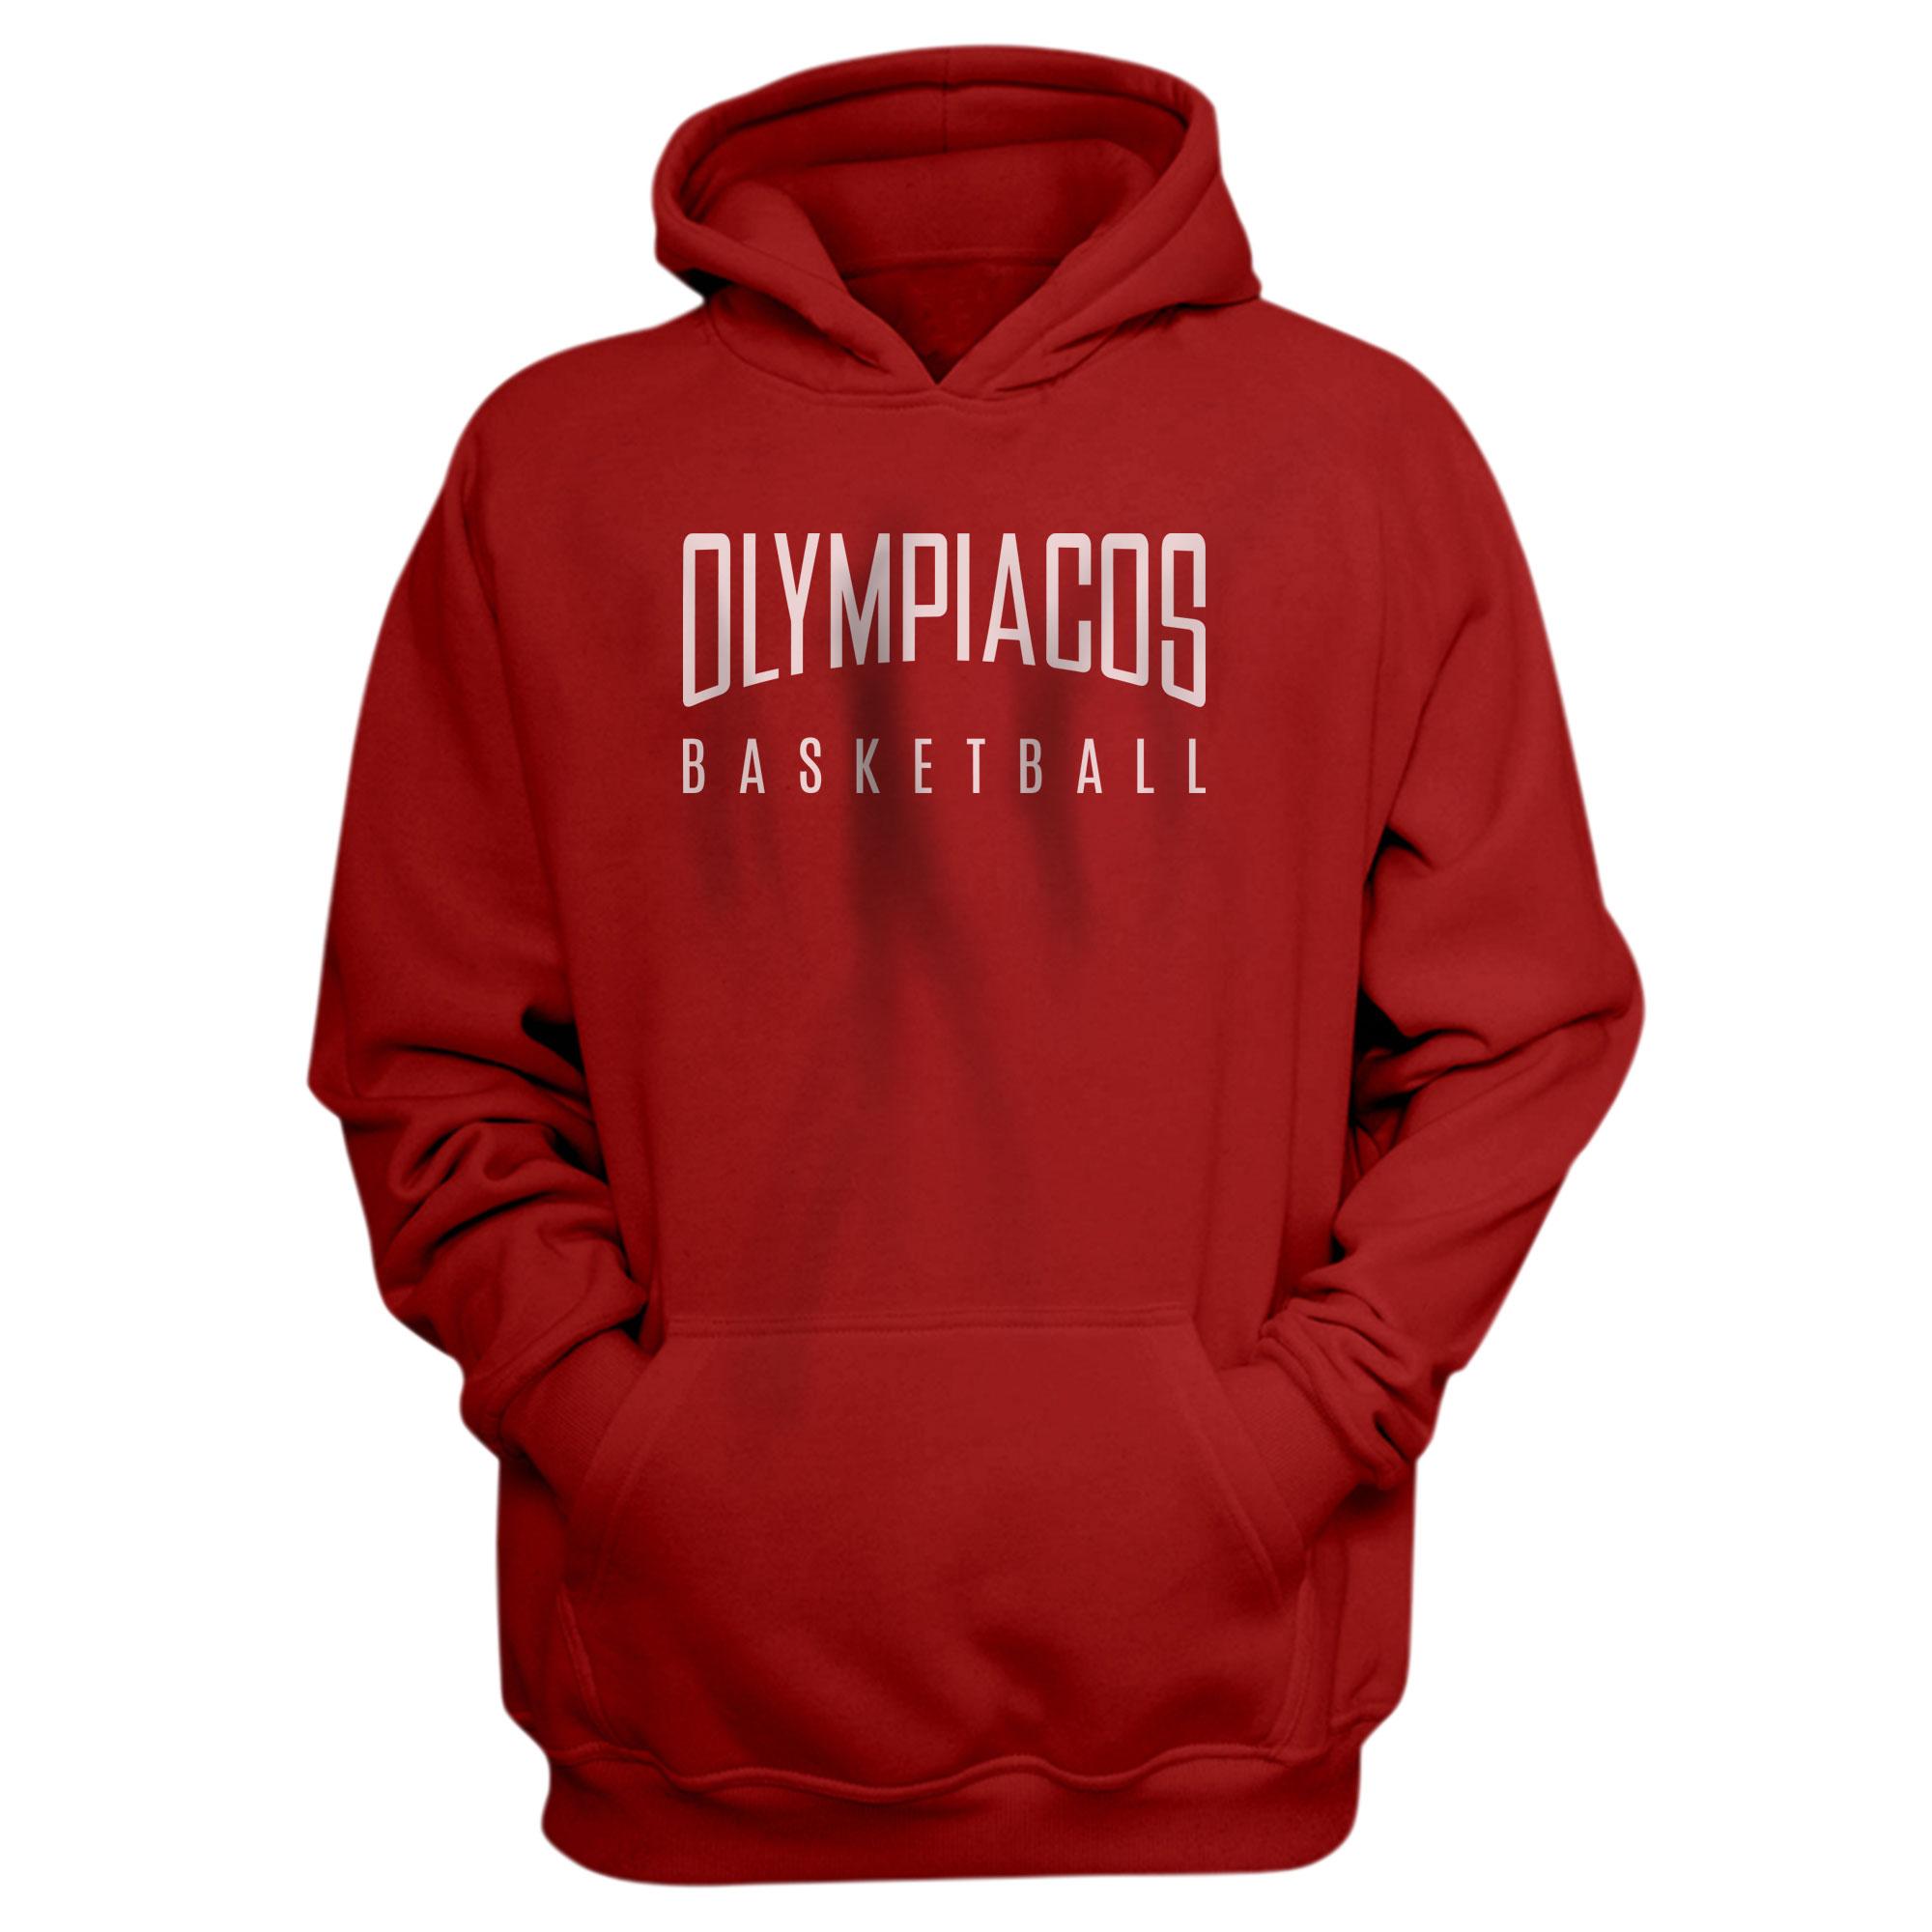 Olympiakos Basketball Hoodie (HD-RED-NP-OLYMPIAKOS-609)